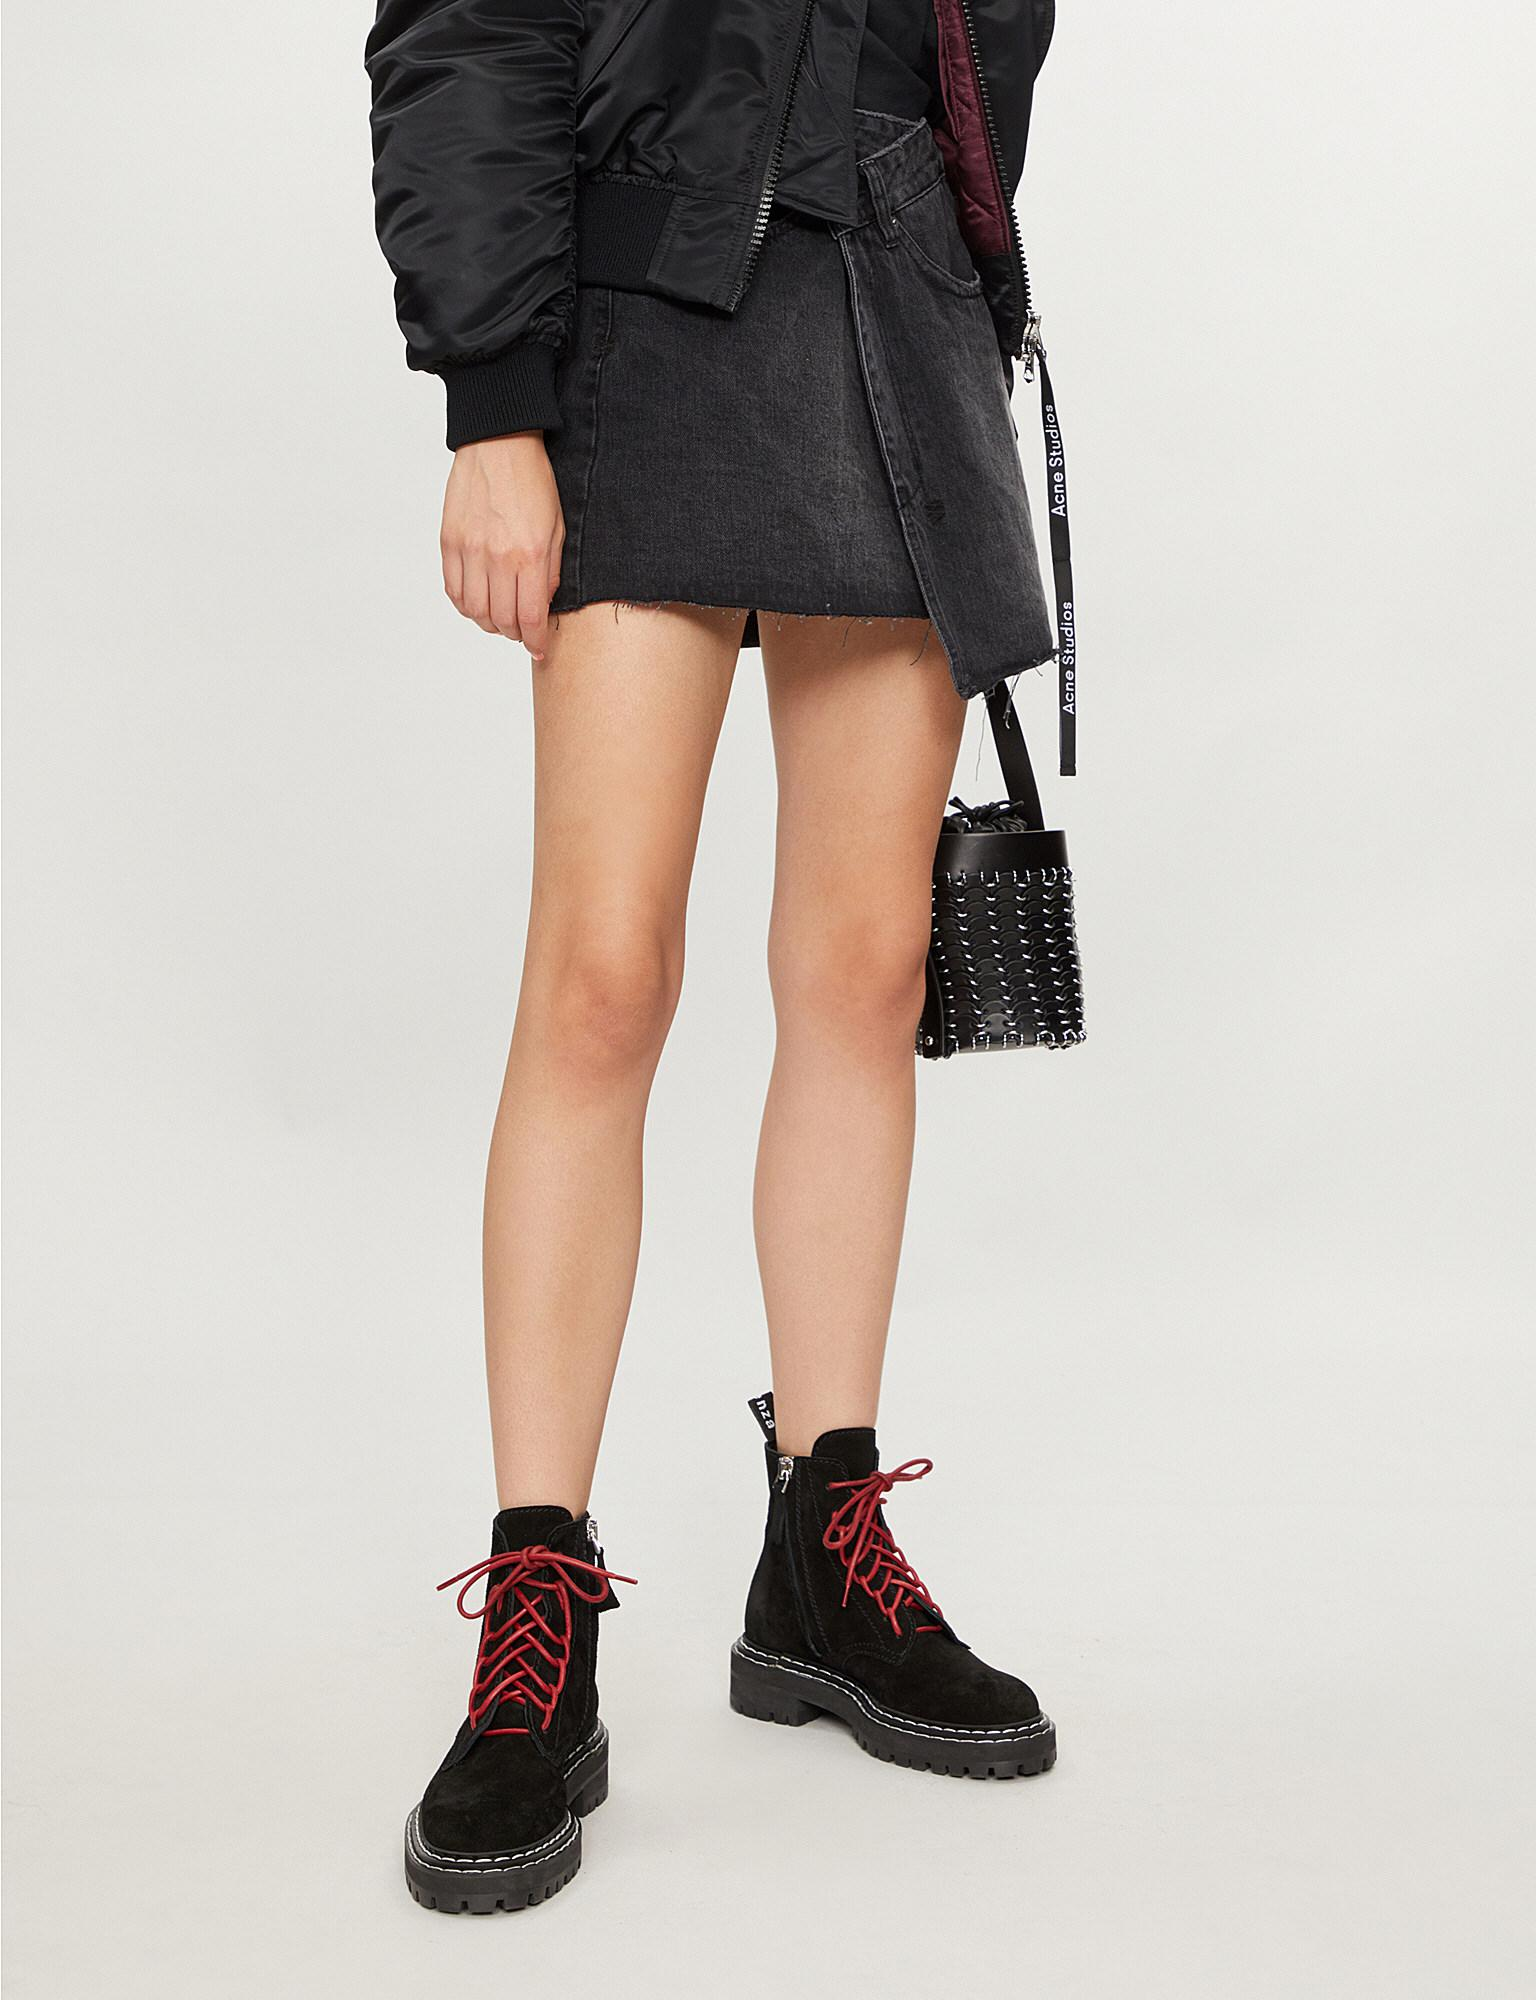 5126bd9756 Ksubi Wrap Denim Skirt – DACC